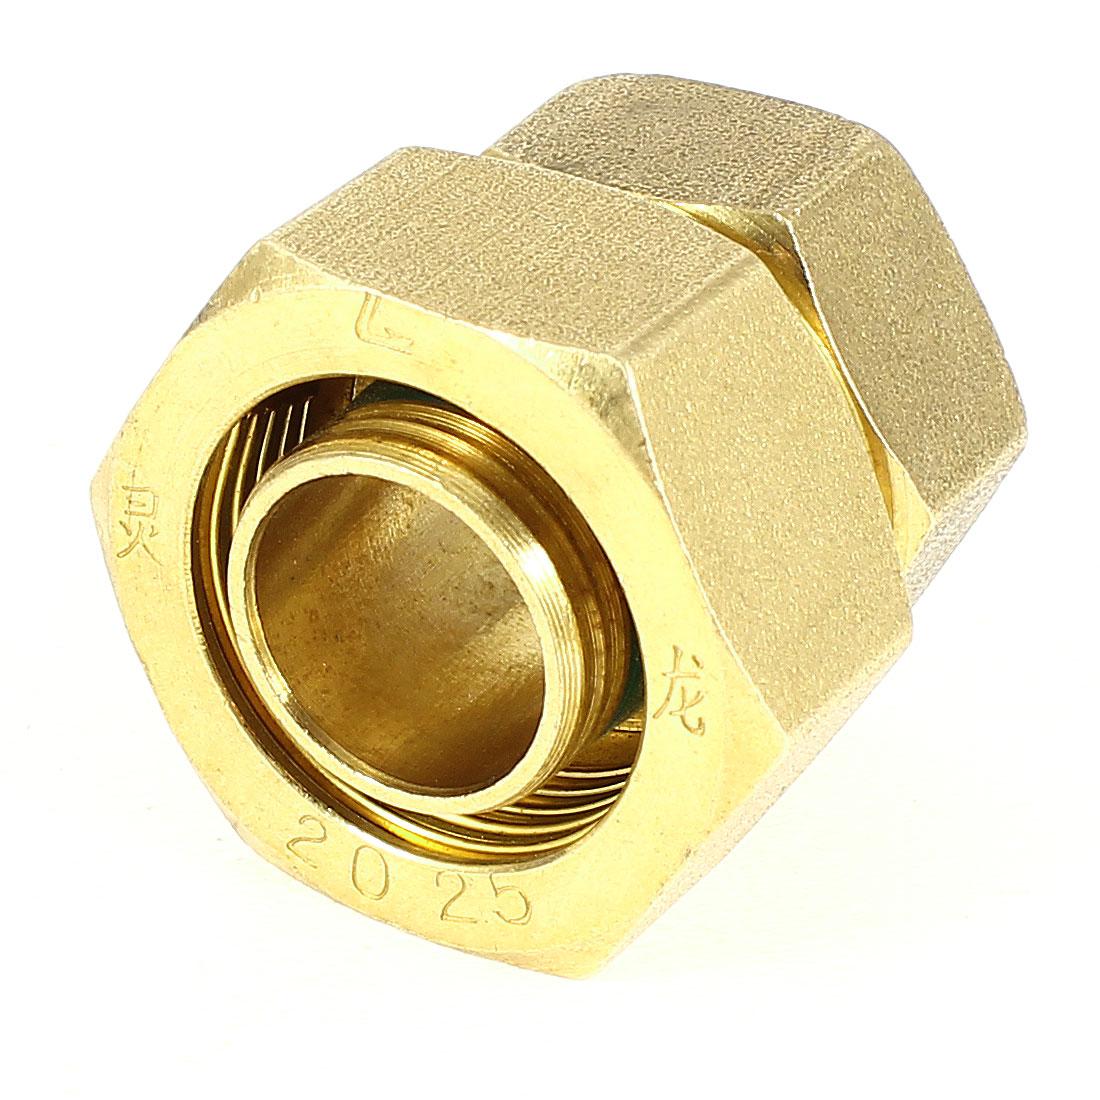 "1"" to 3/4"" PEXworx Pex-Al-Pex Compression x FPT Brass Pipe Fitting"